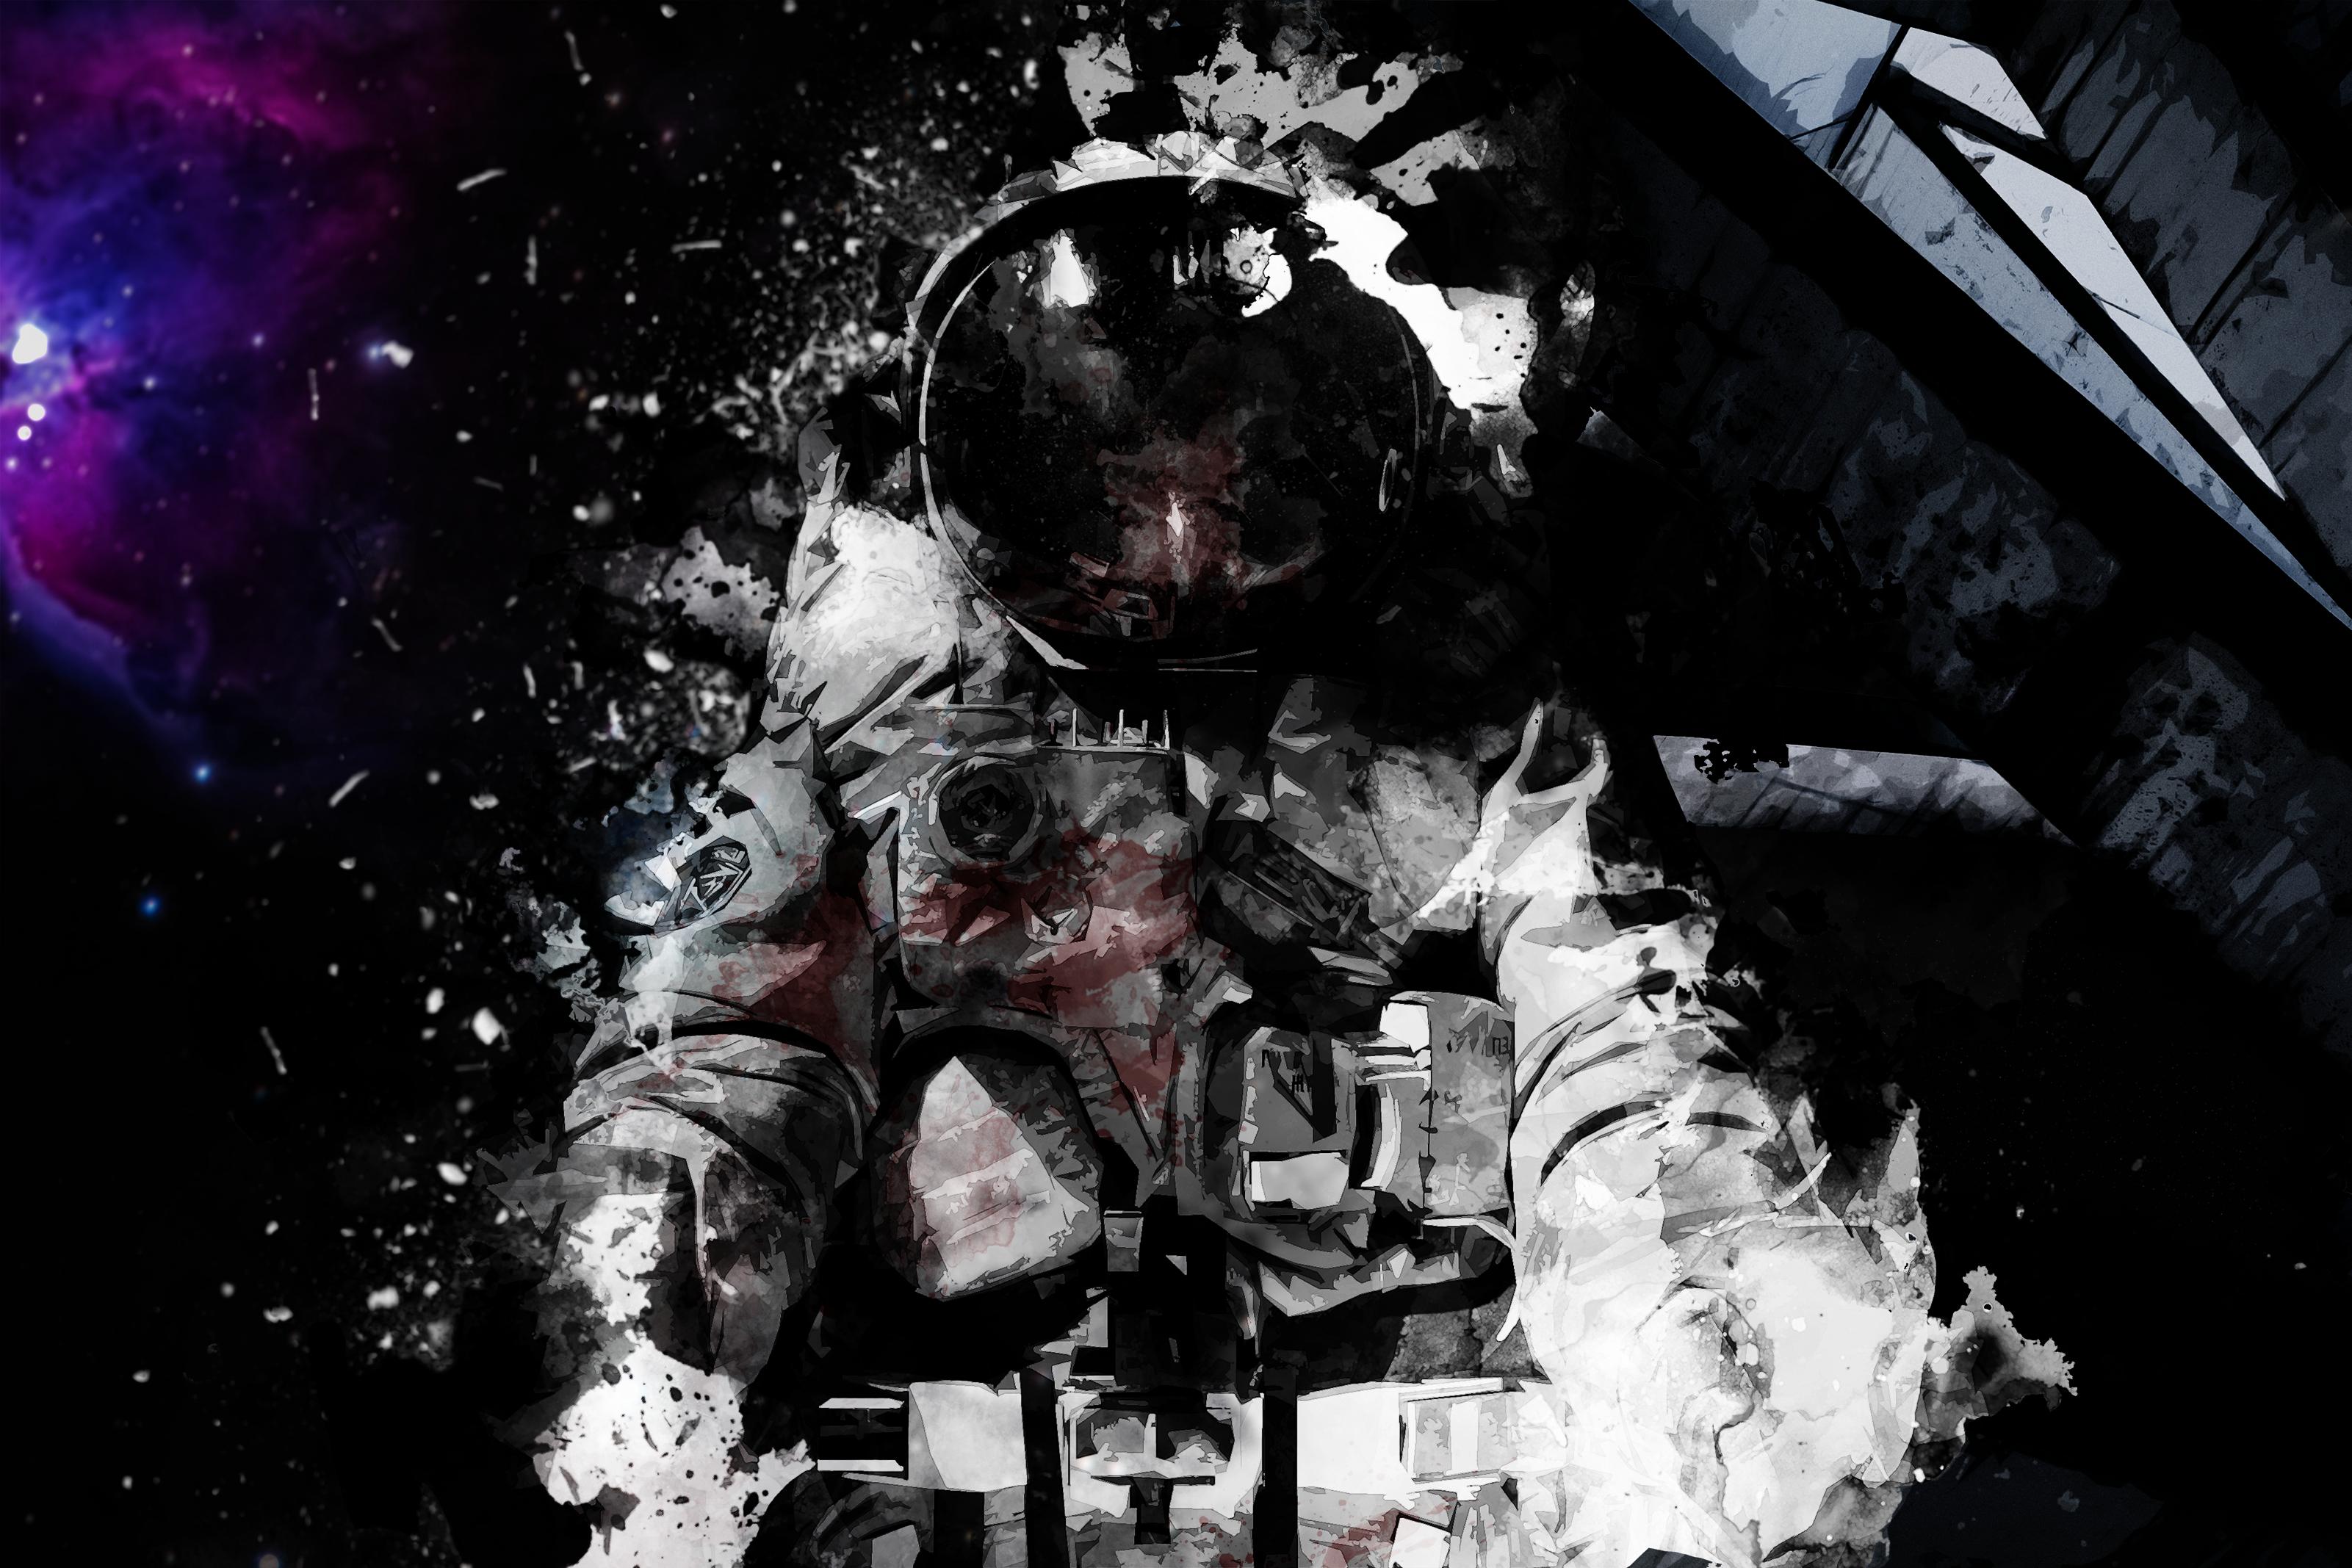 Astro-Soldier3